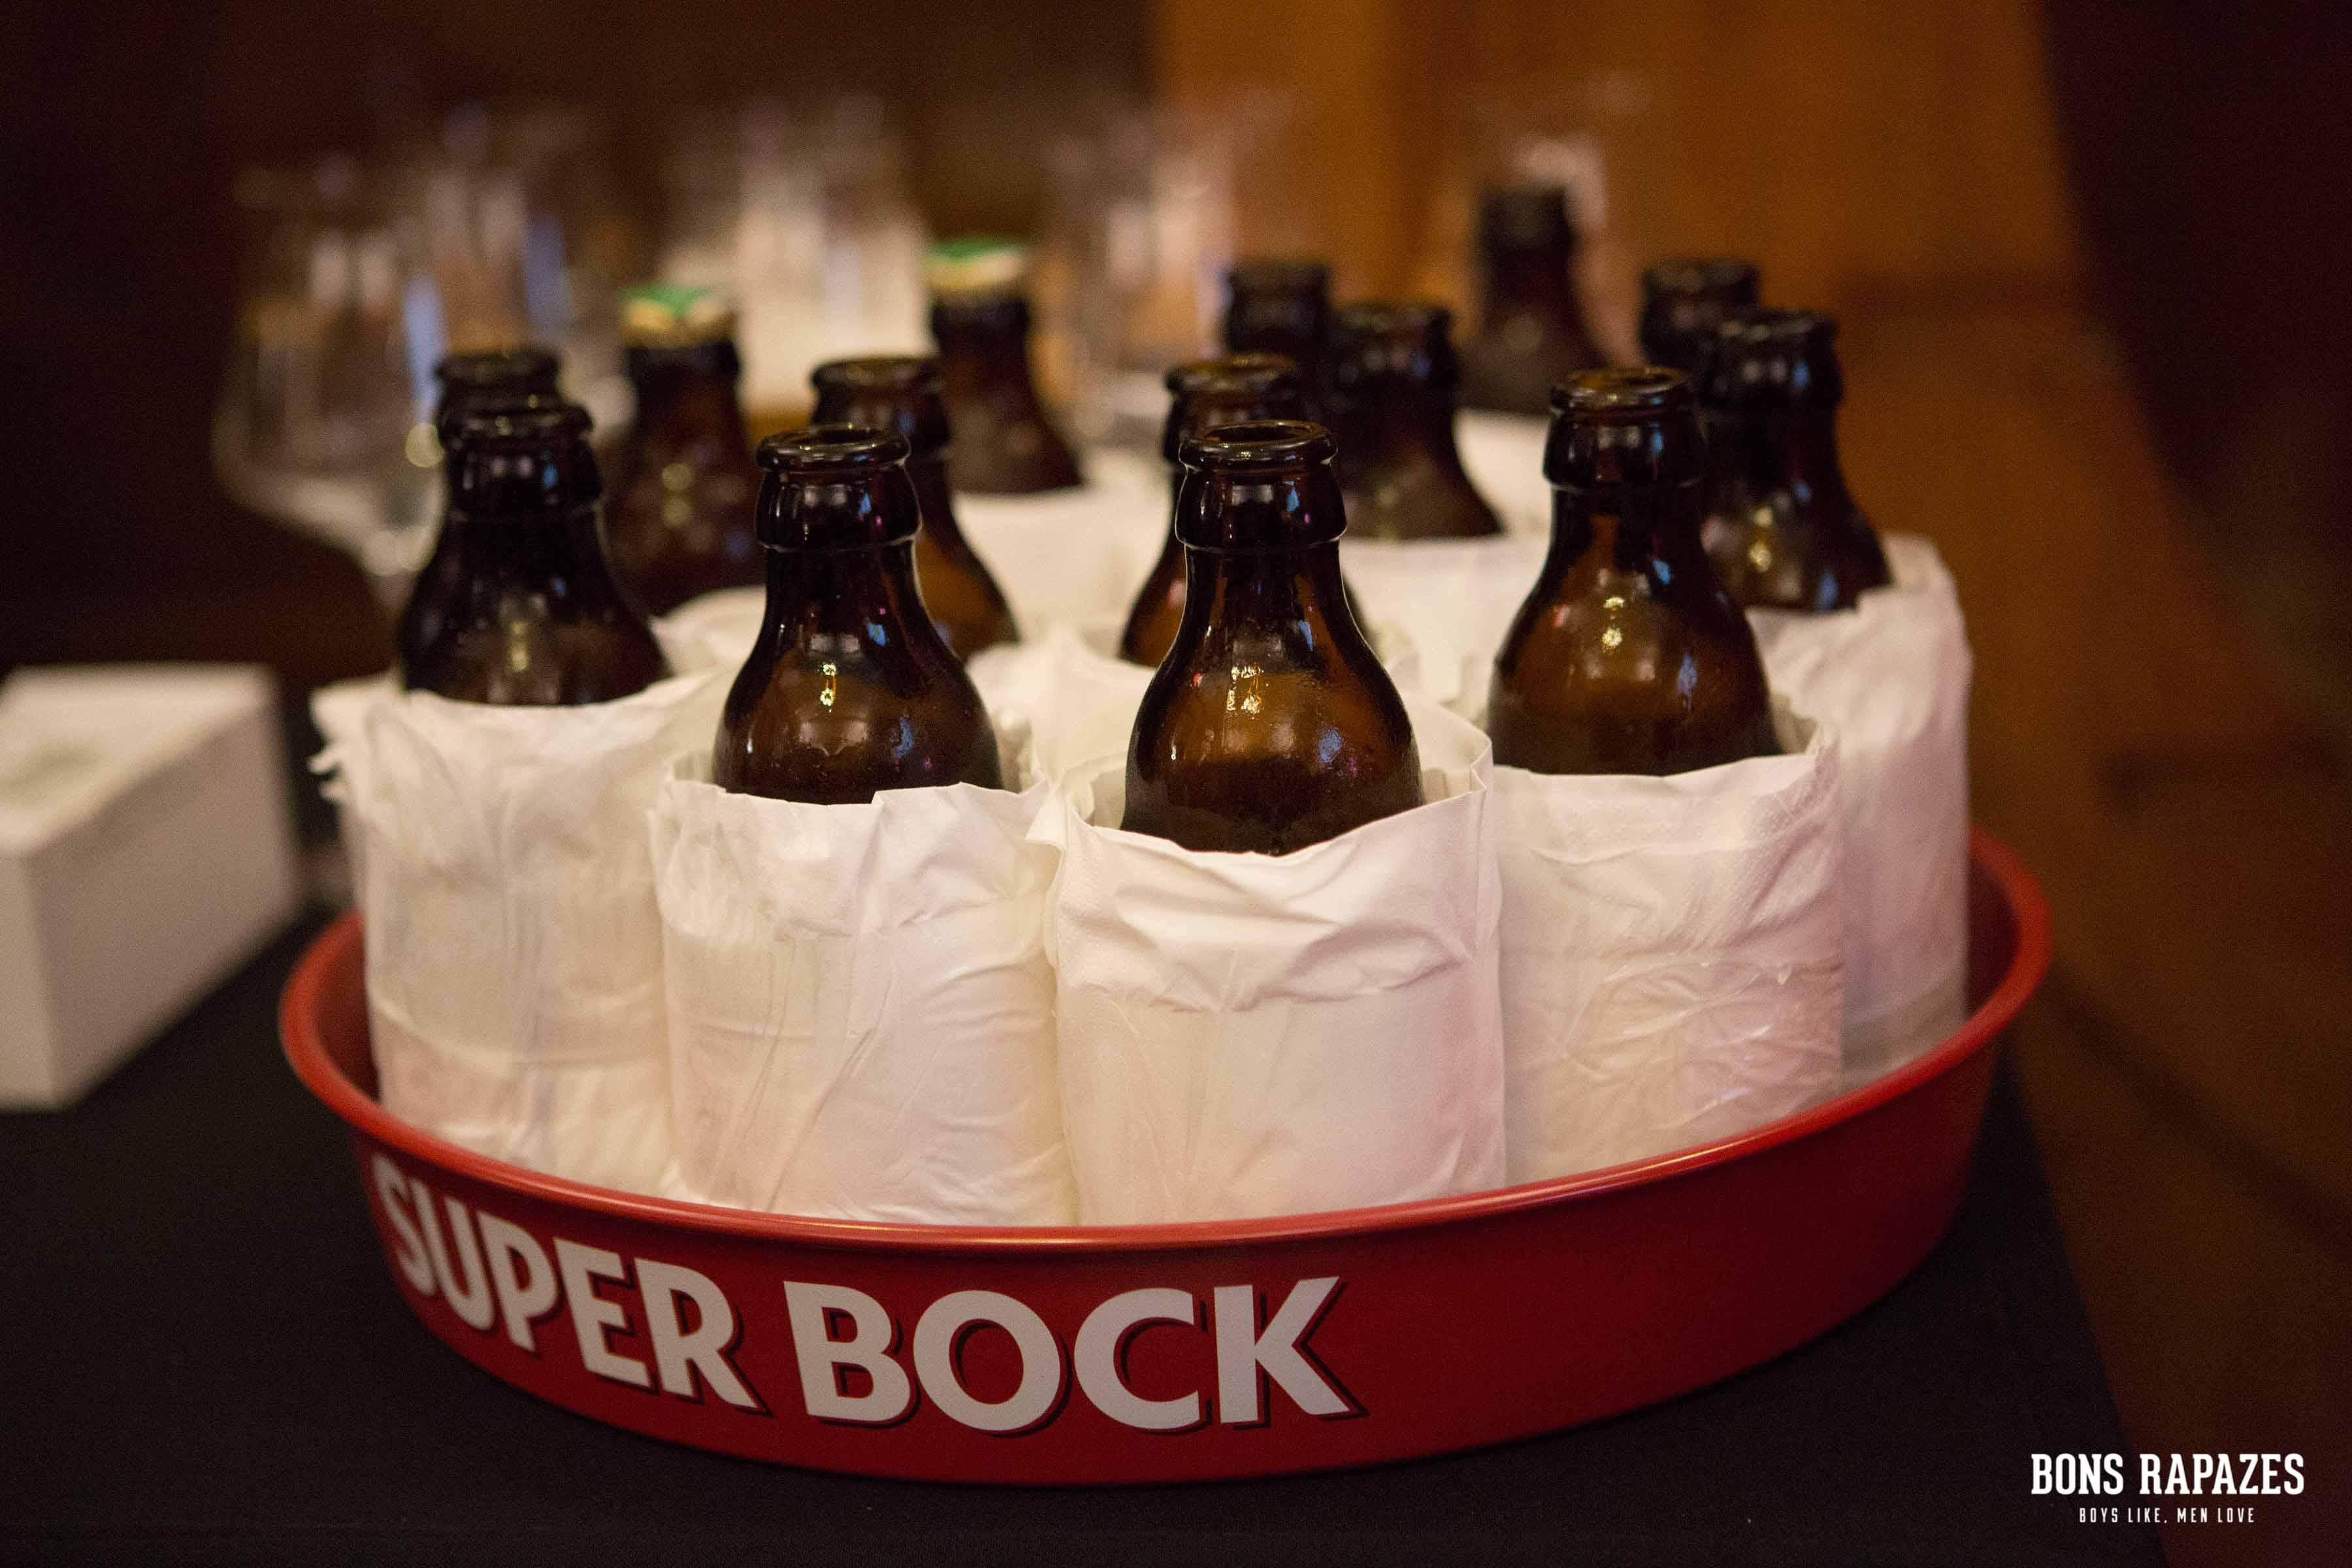 bons-rapazes-super-bock-beer-experience-22